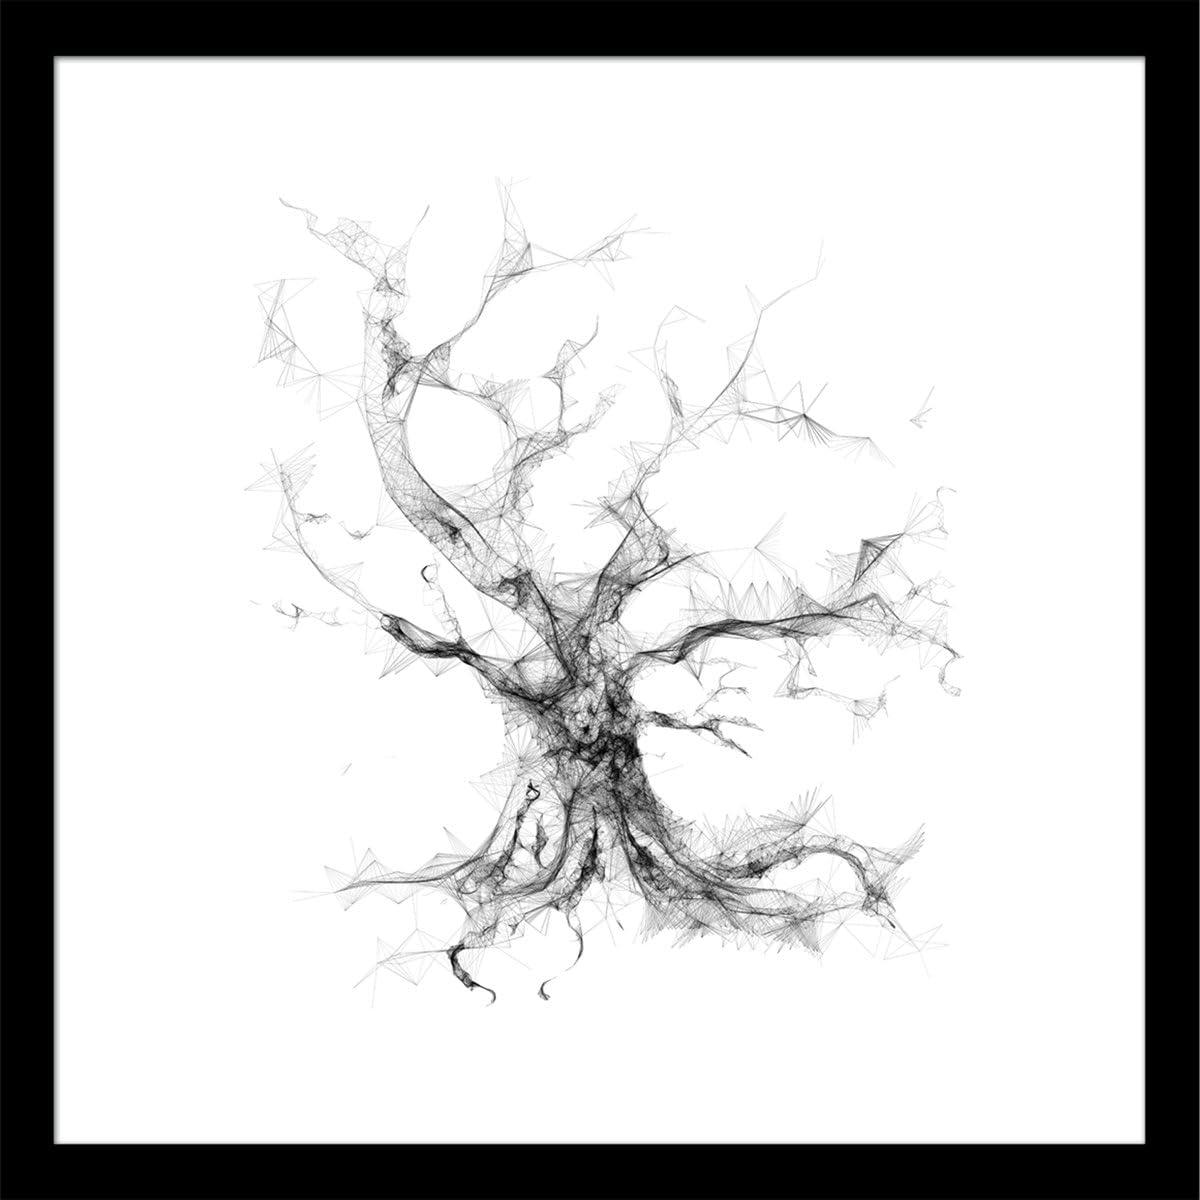 Amazon Com Line Tree 03 Jordan Rogers Home Kitchen